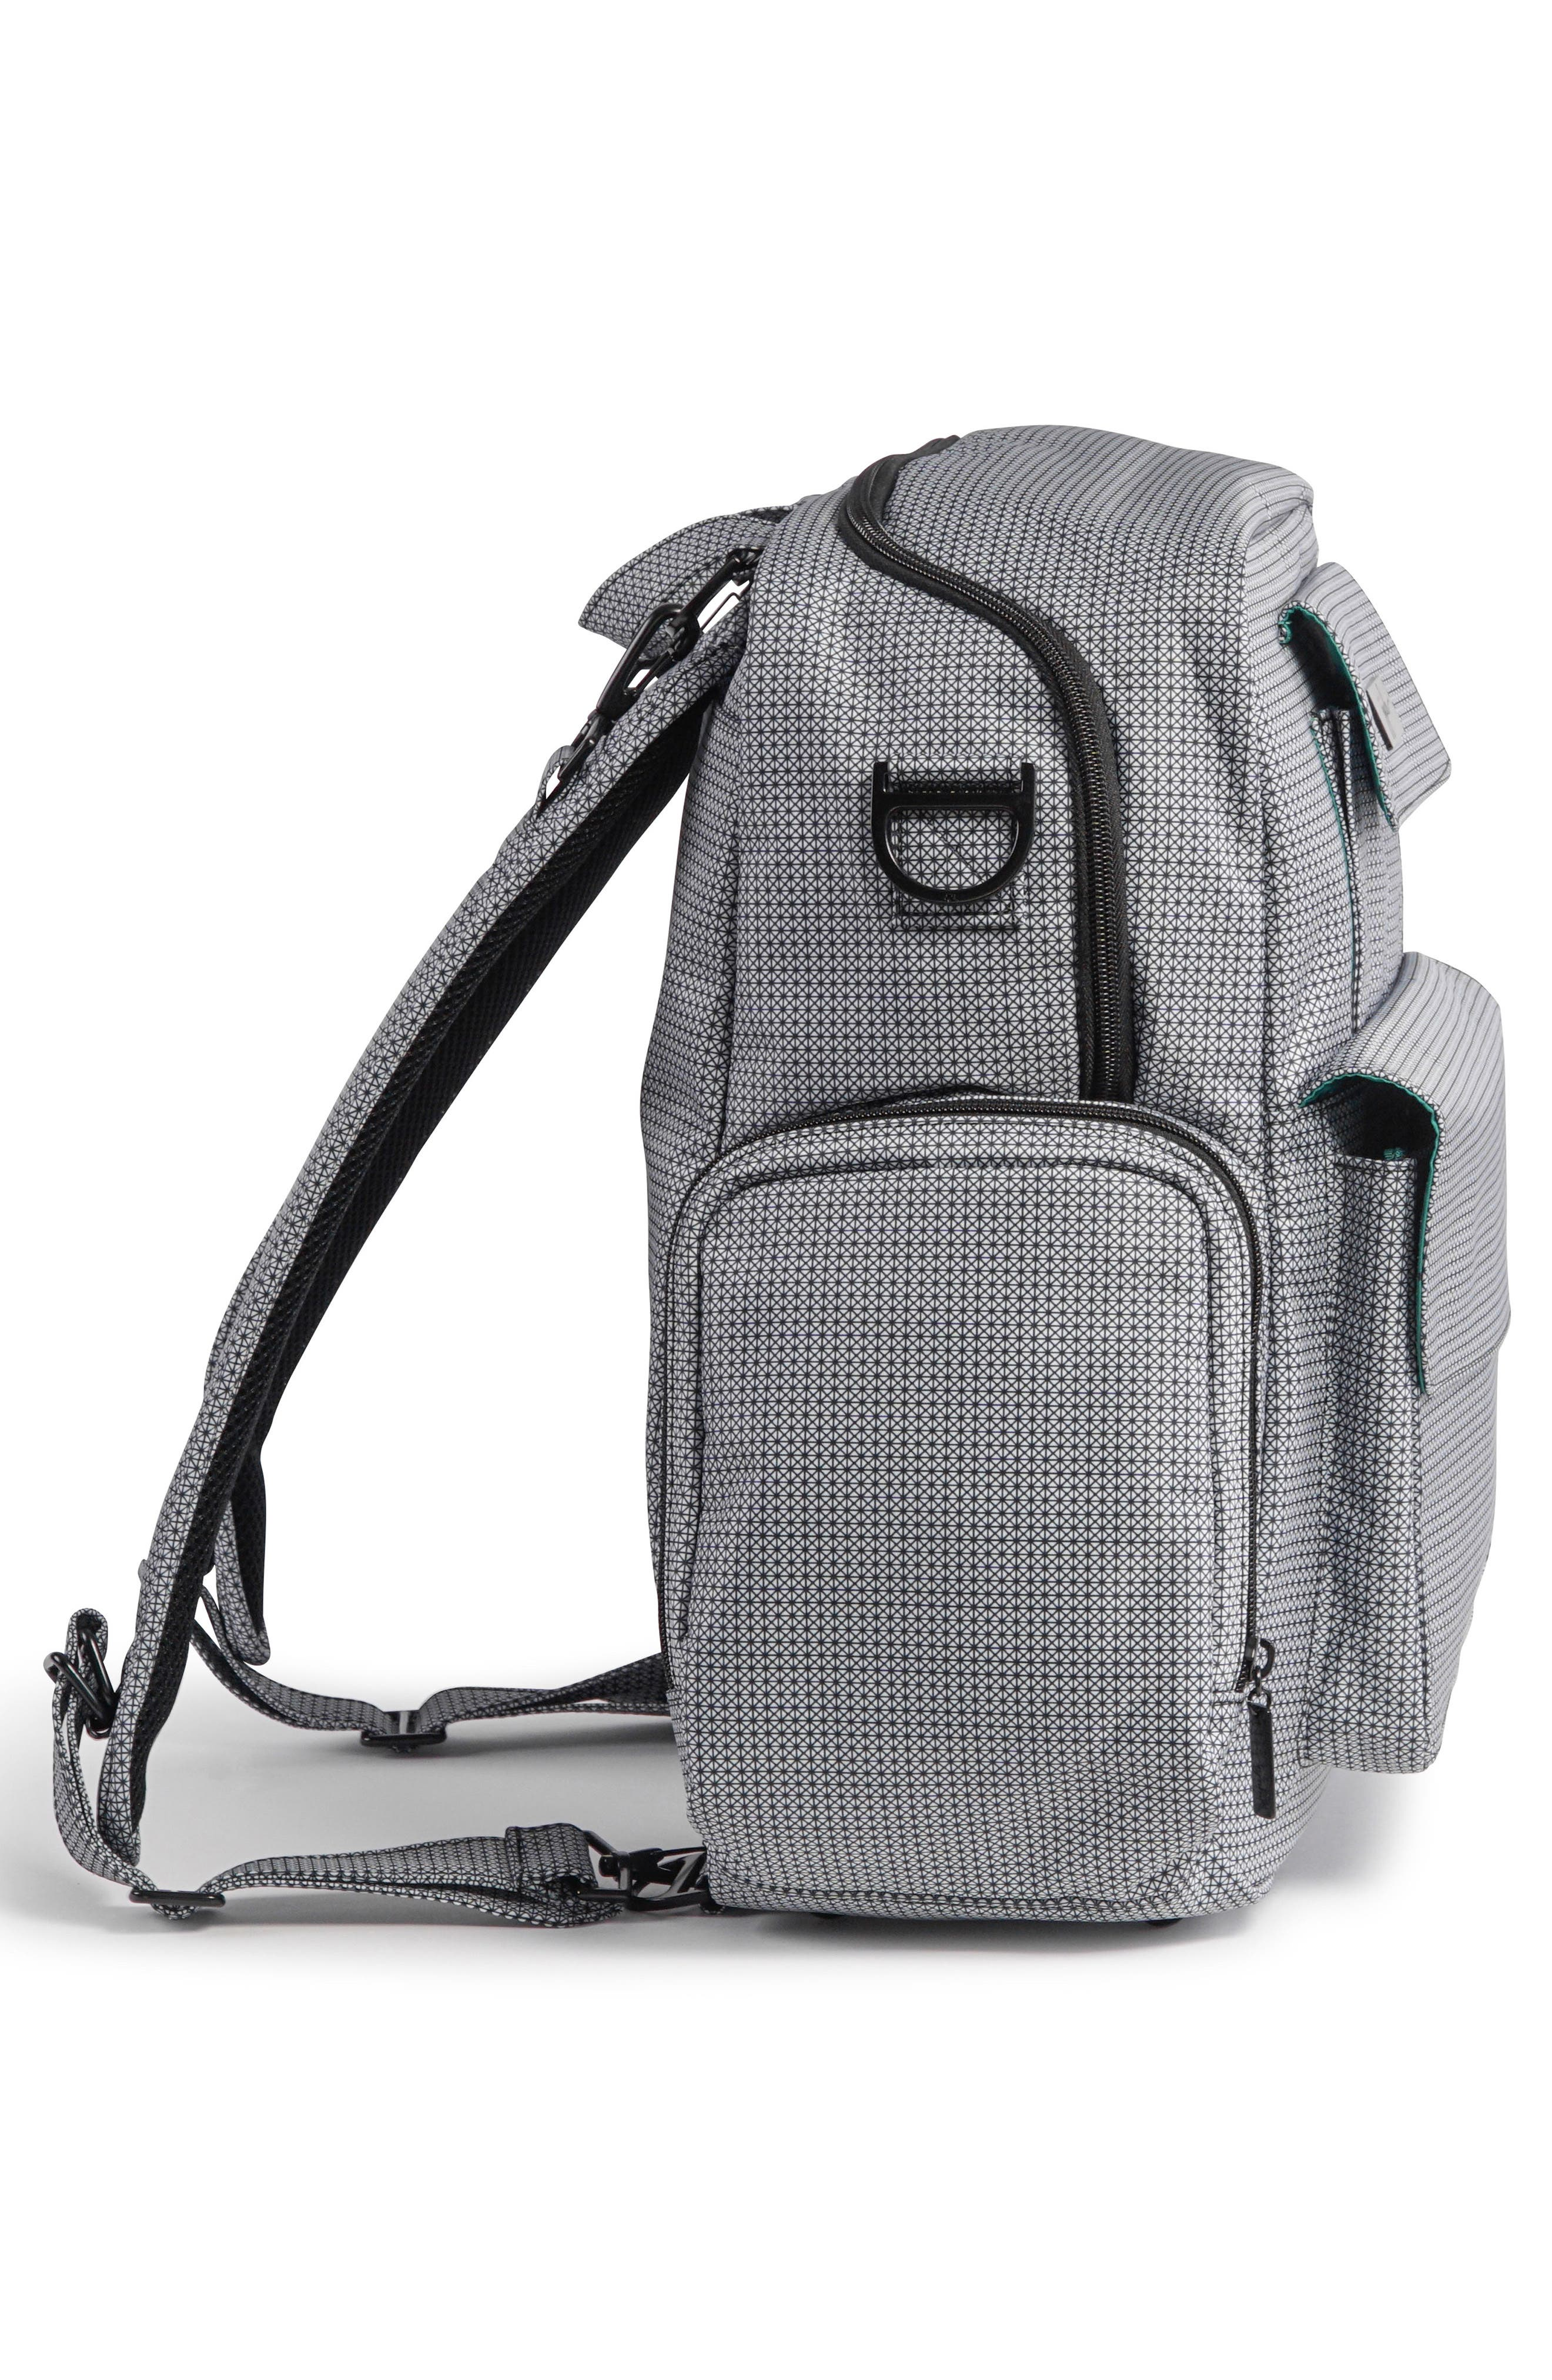 Be Nurtured Pumping Backpack,                             Alternate thumbnail 5, color,                             BLACK MATRIX